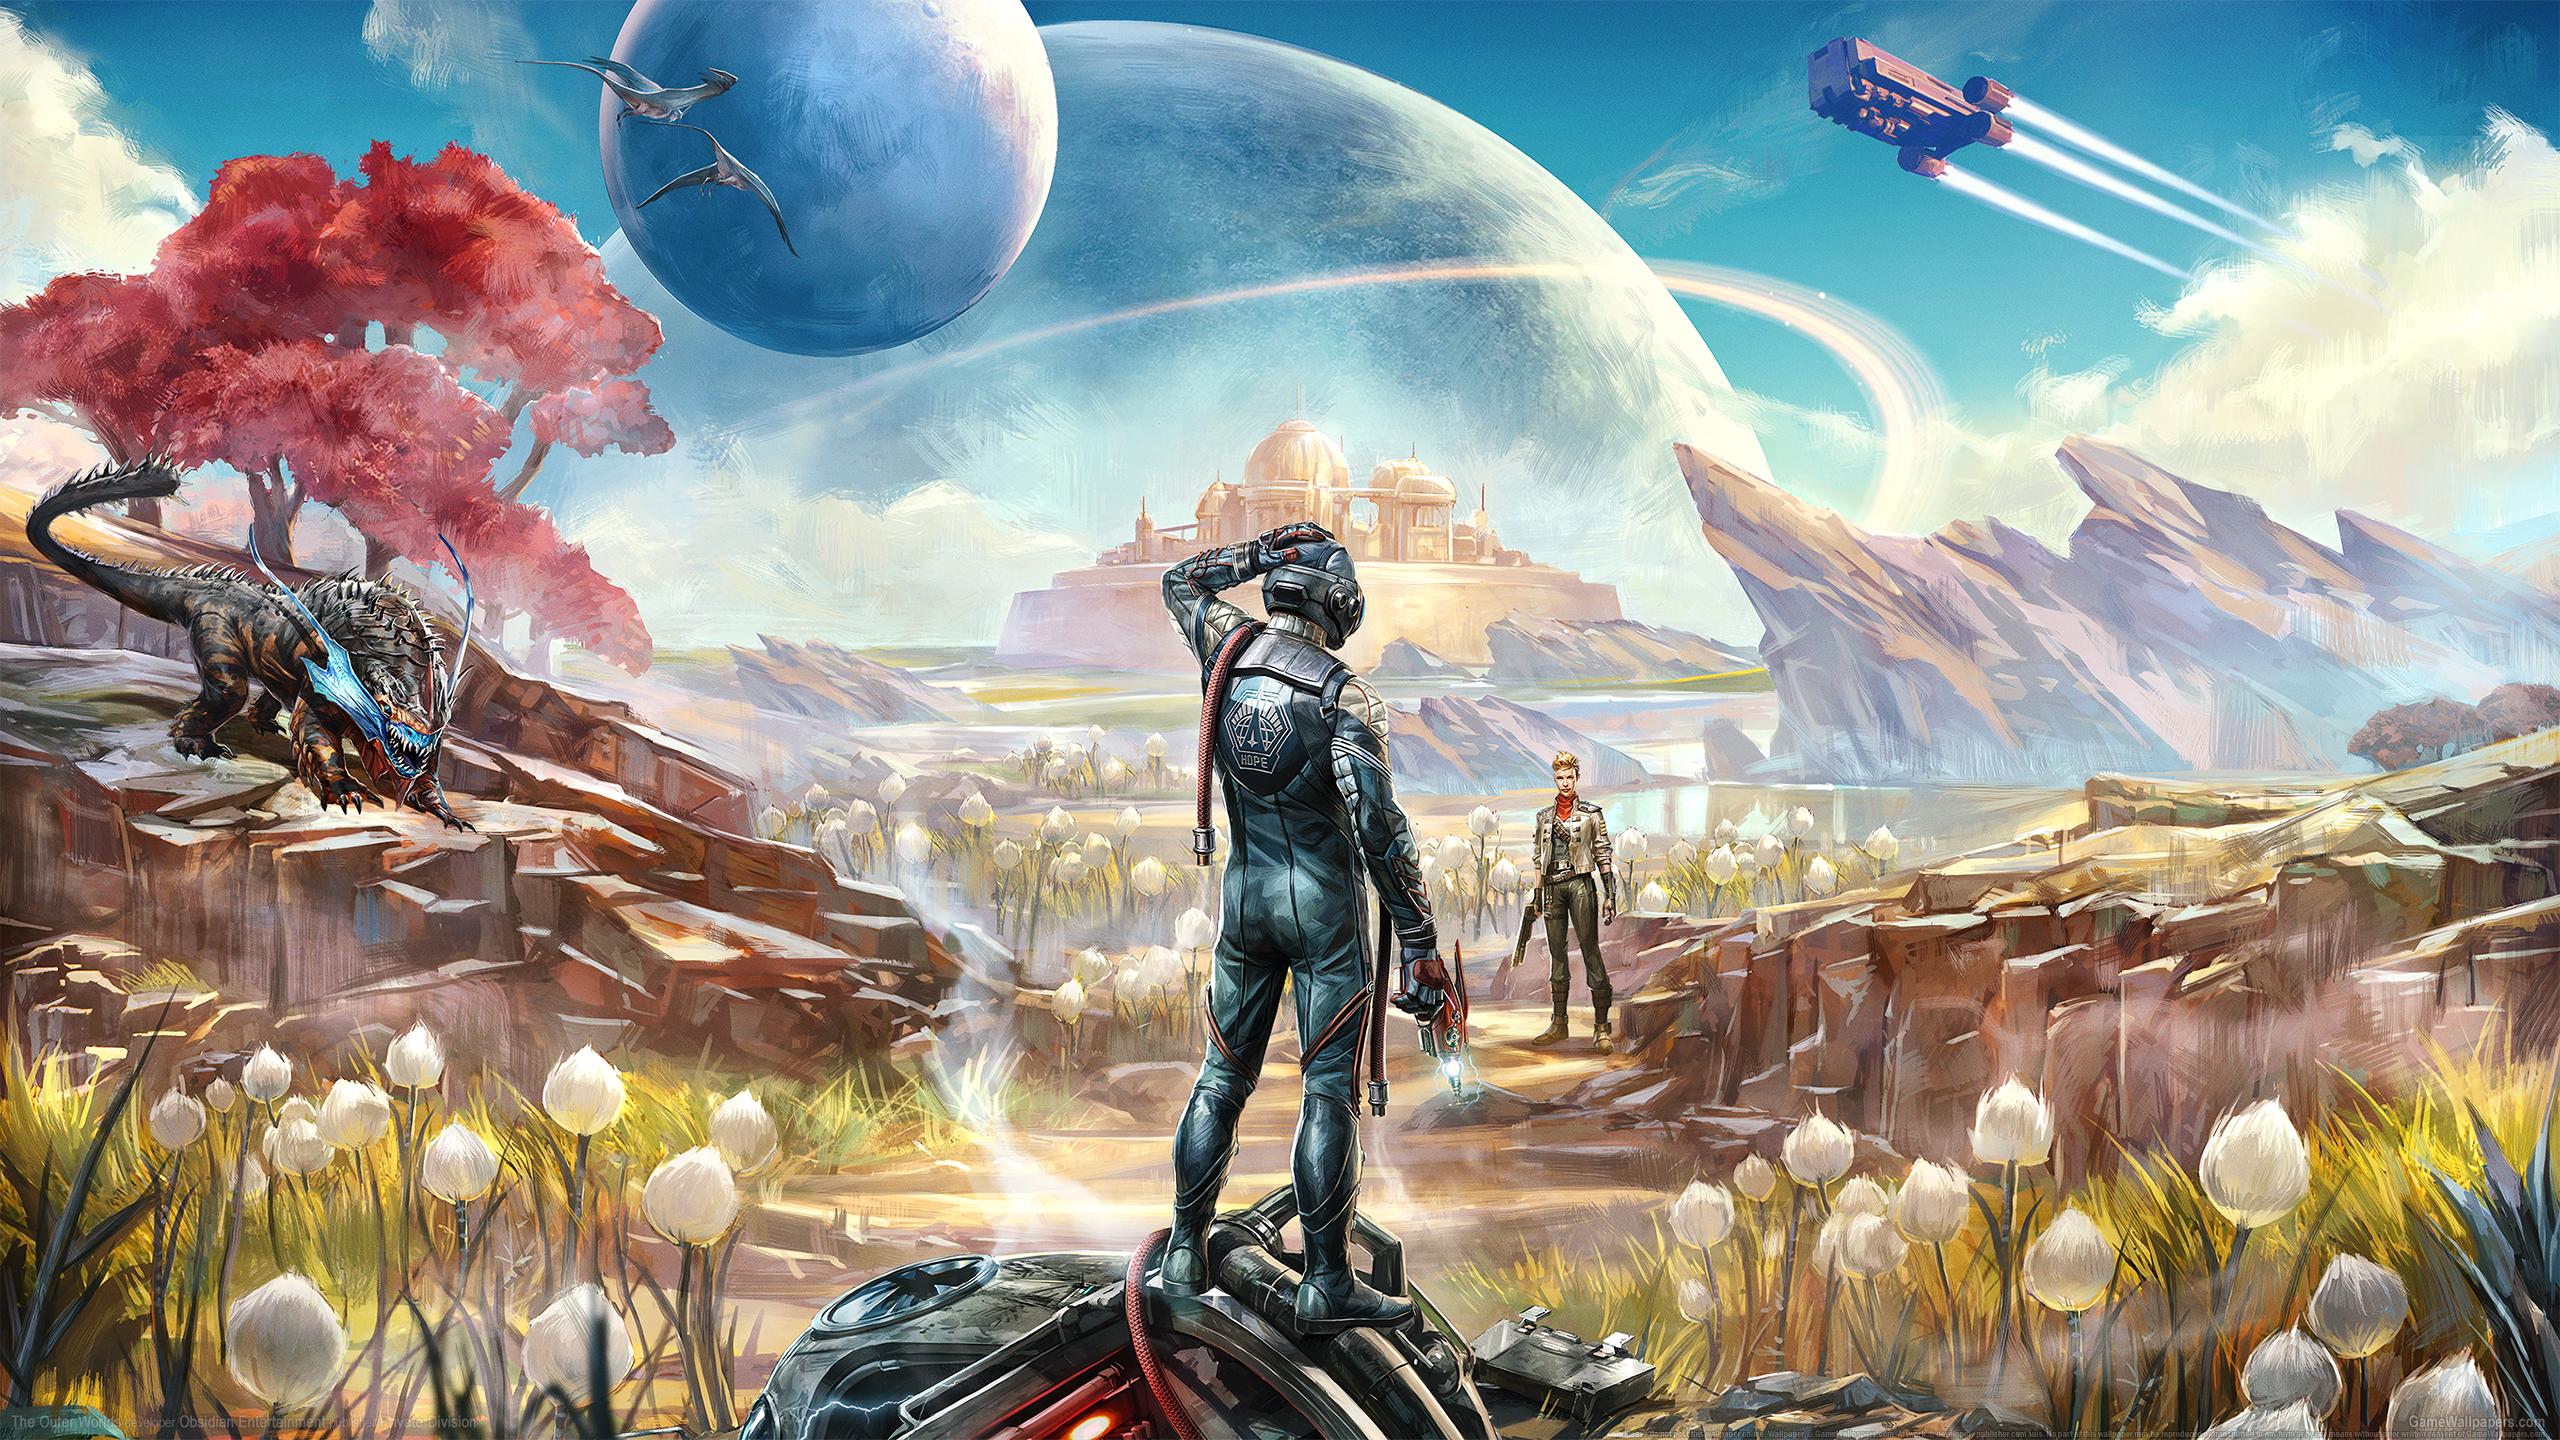 The Outer Worlds 2560x1440 Hintergrundbild 01